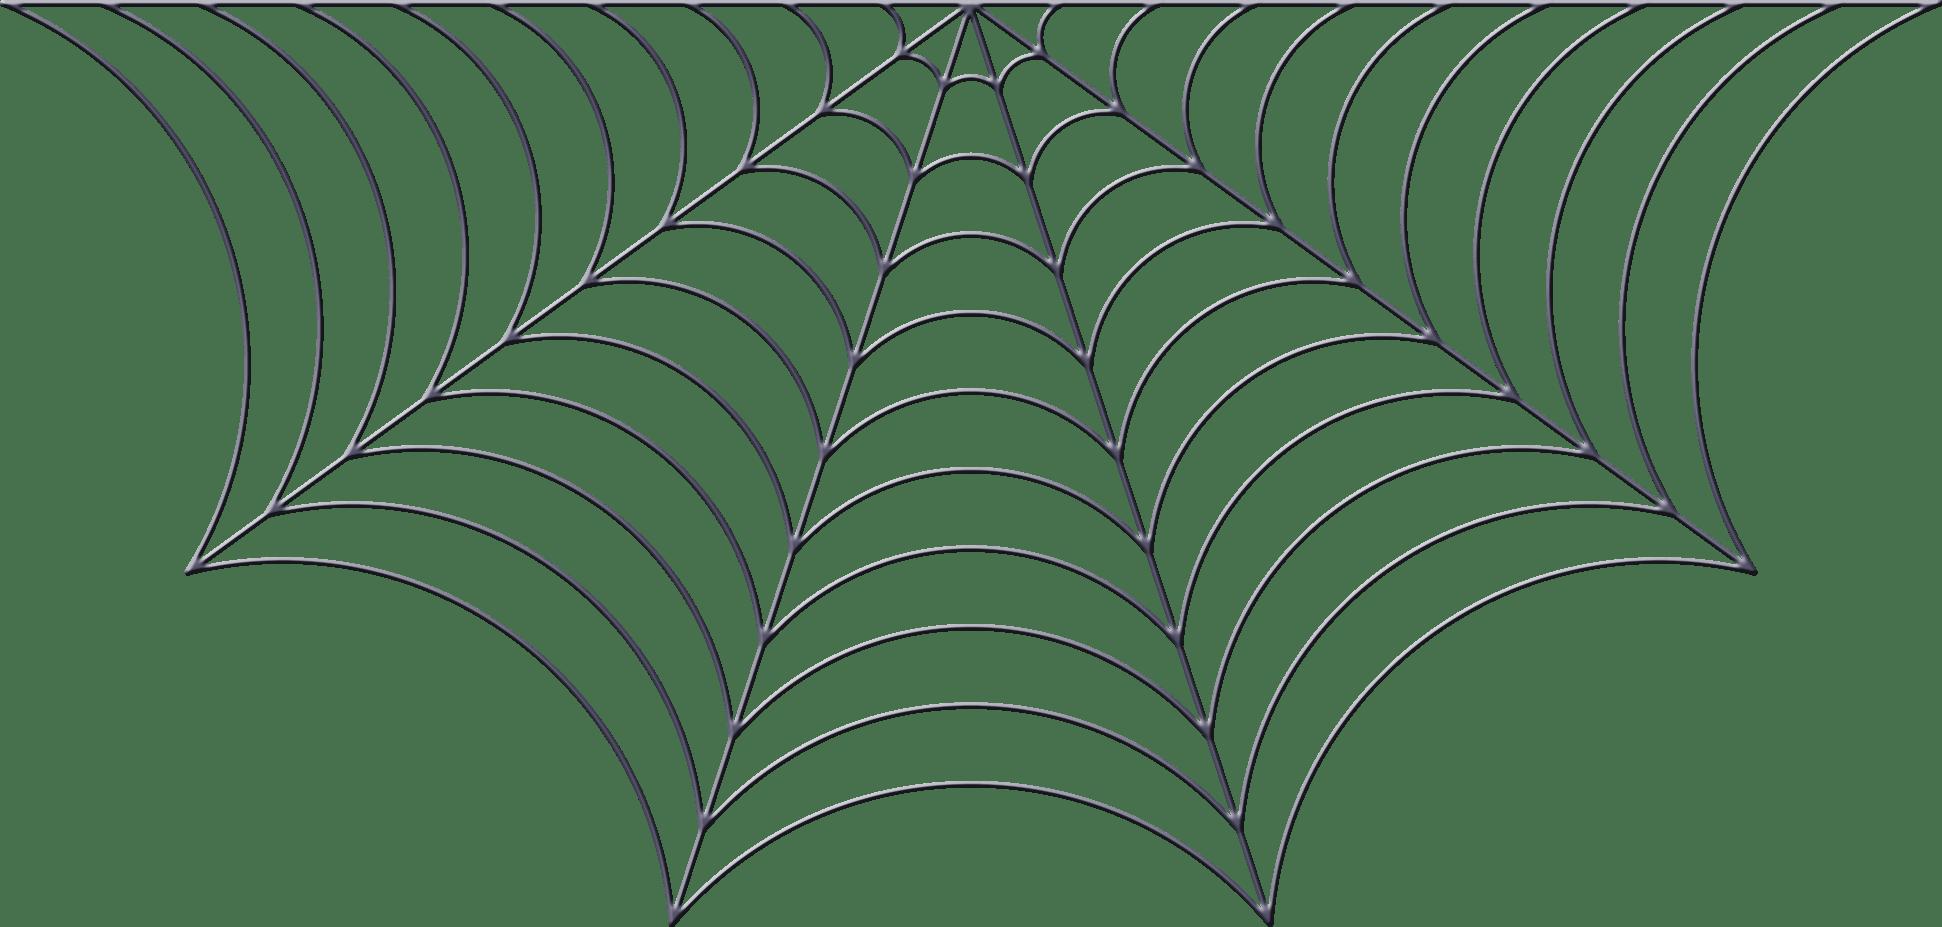 Spiderweb Clipart Food Web Spiderweb Food Web Transparent